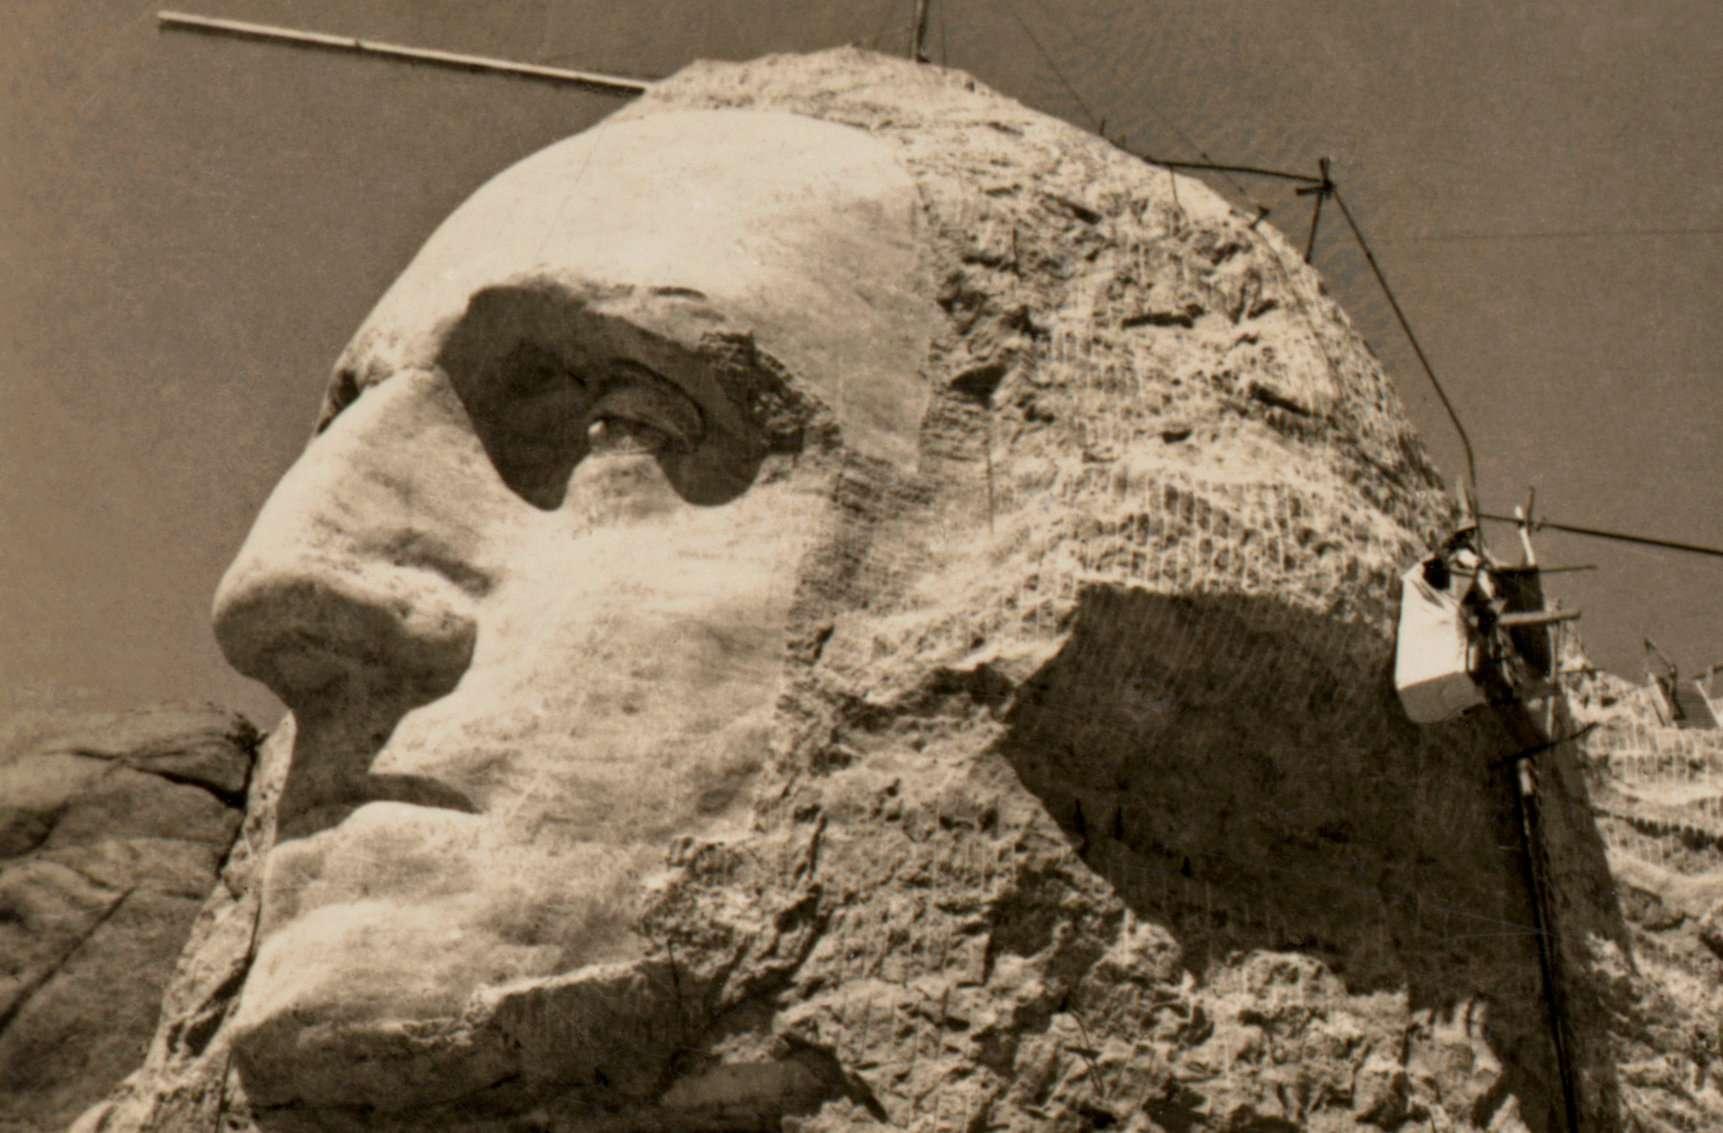 Washington's face under construction at Mt. Rushmore